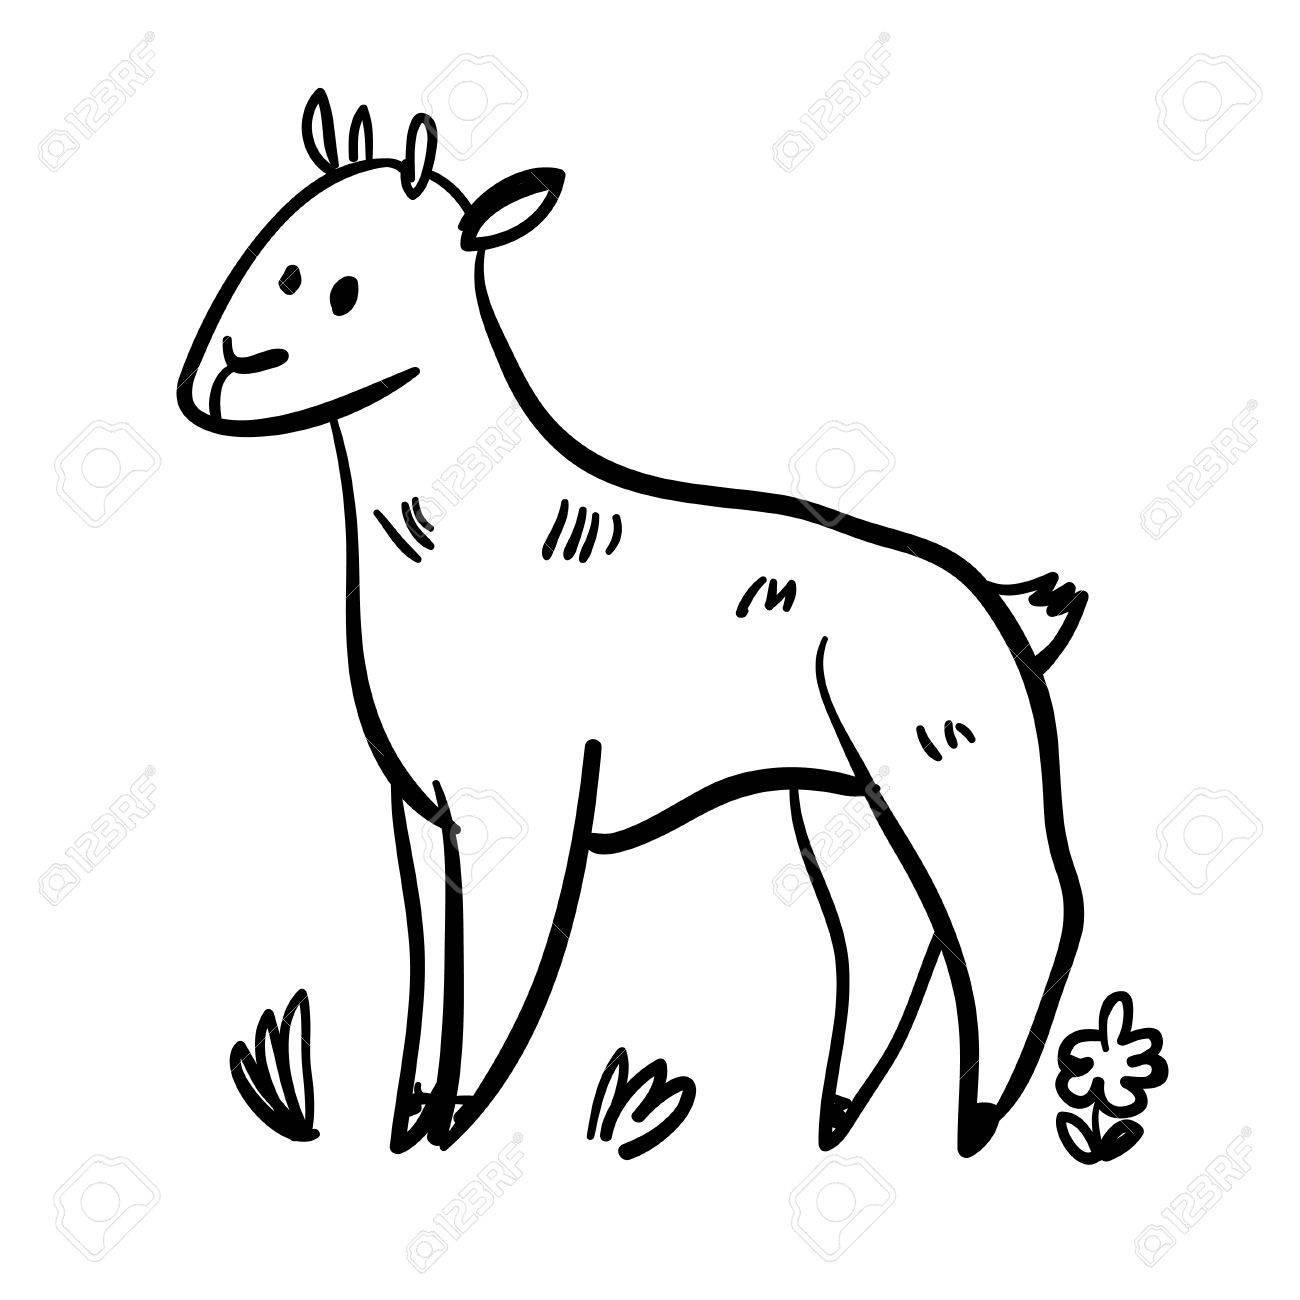 1300x1300 Vector Illustration Set With Nanny Goat. Funny Doodle Goat. Handy